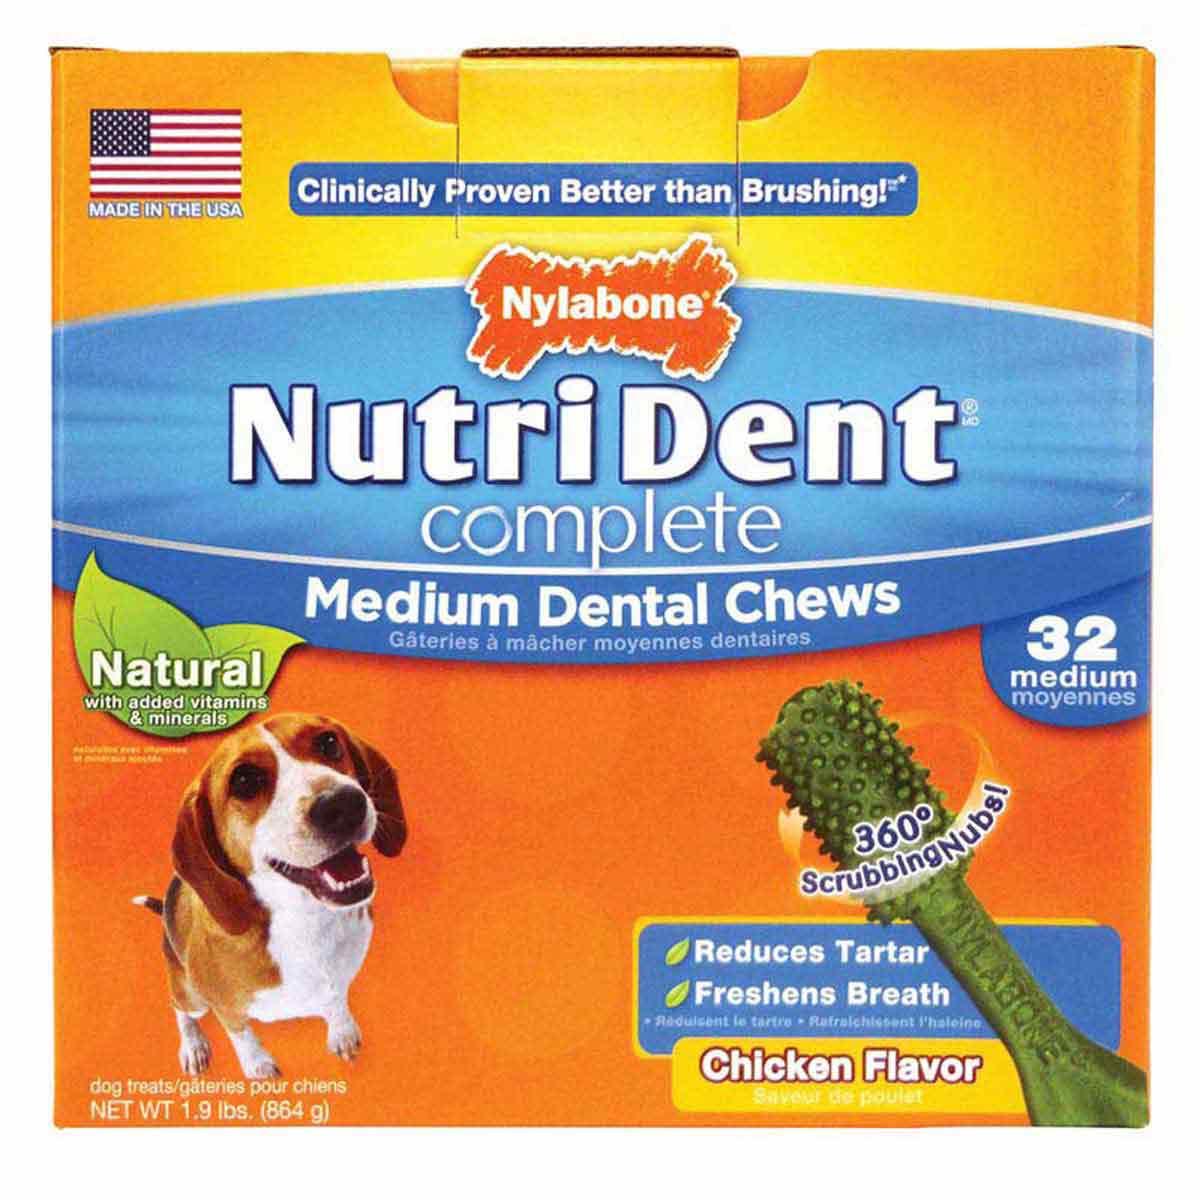 Nylabone Nutri Dent Complete Adult Chicken Dental Chews 32 Count